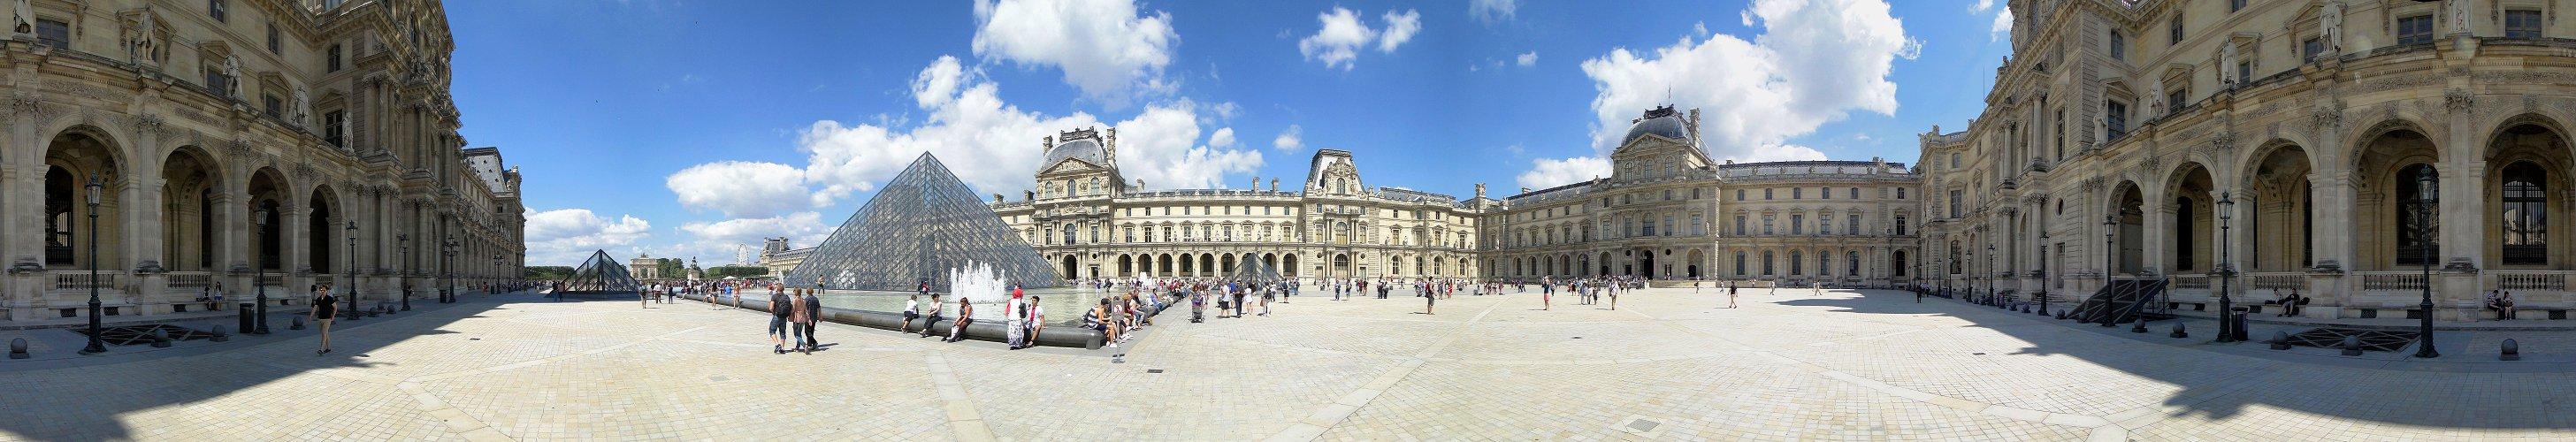 Louvre 360°